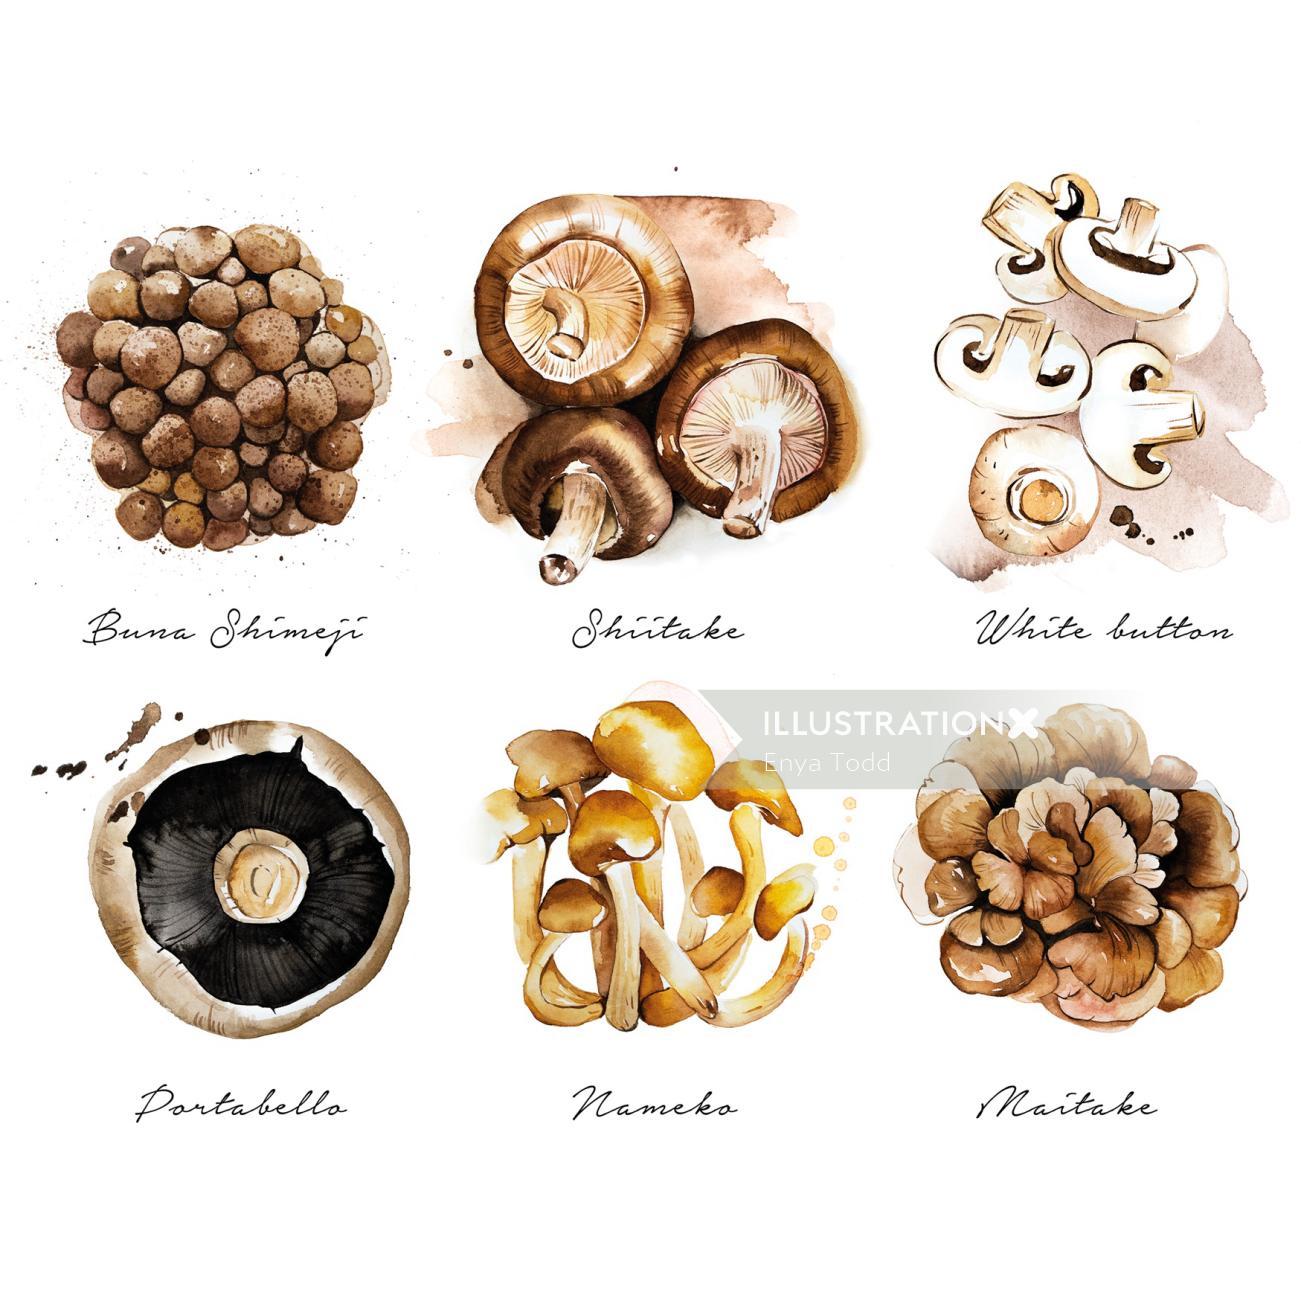 The culinary mushrooms list